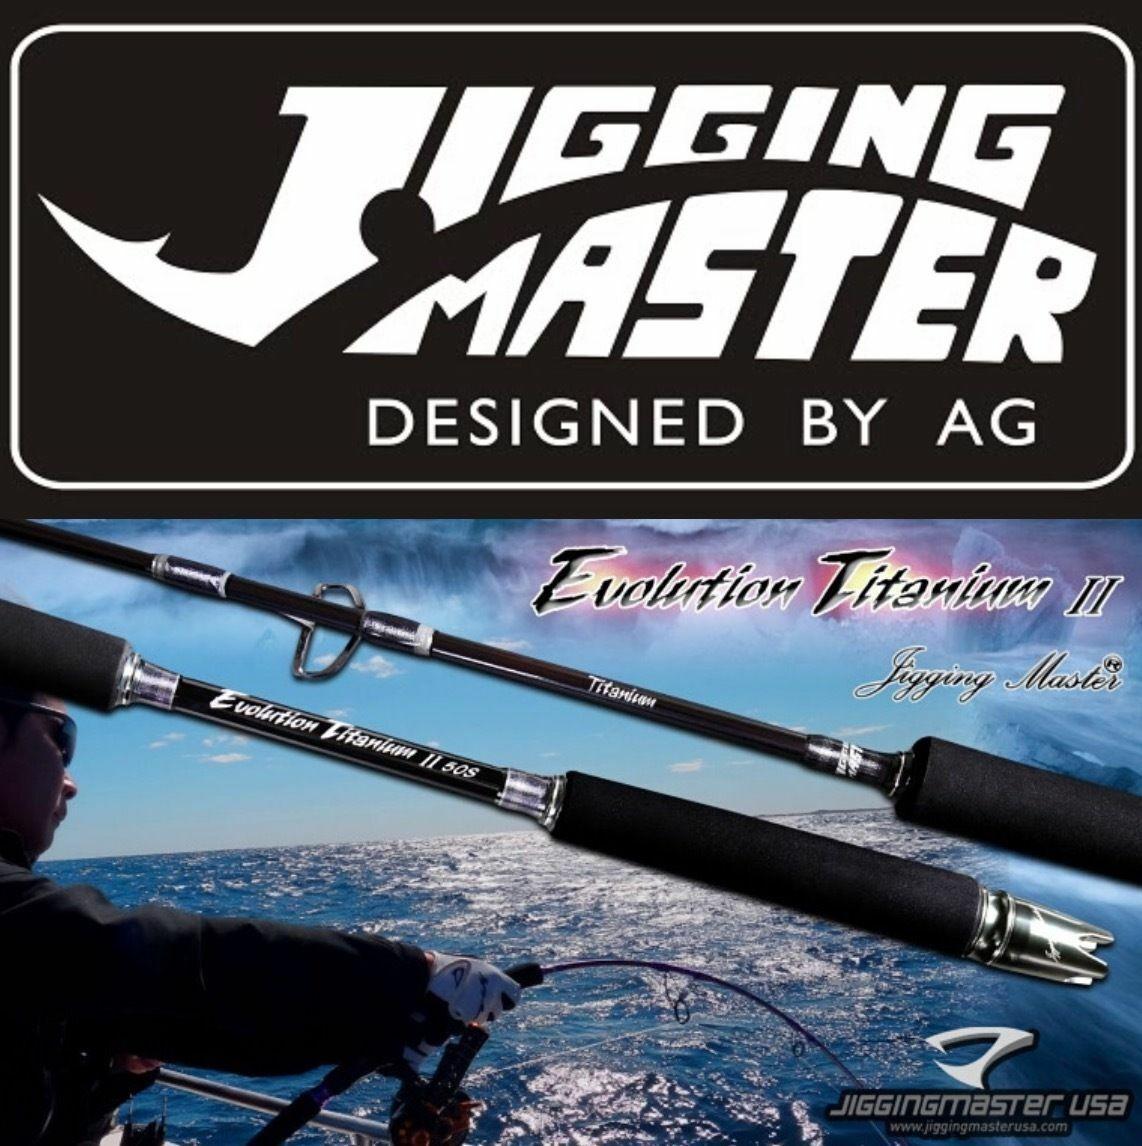 Jigging Master Evolution Titanium II Ultimate Jigging rods